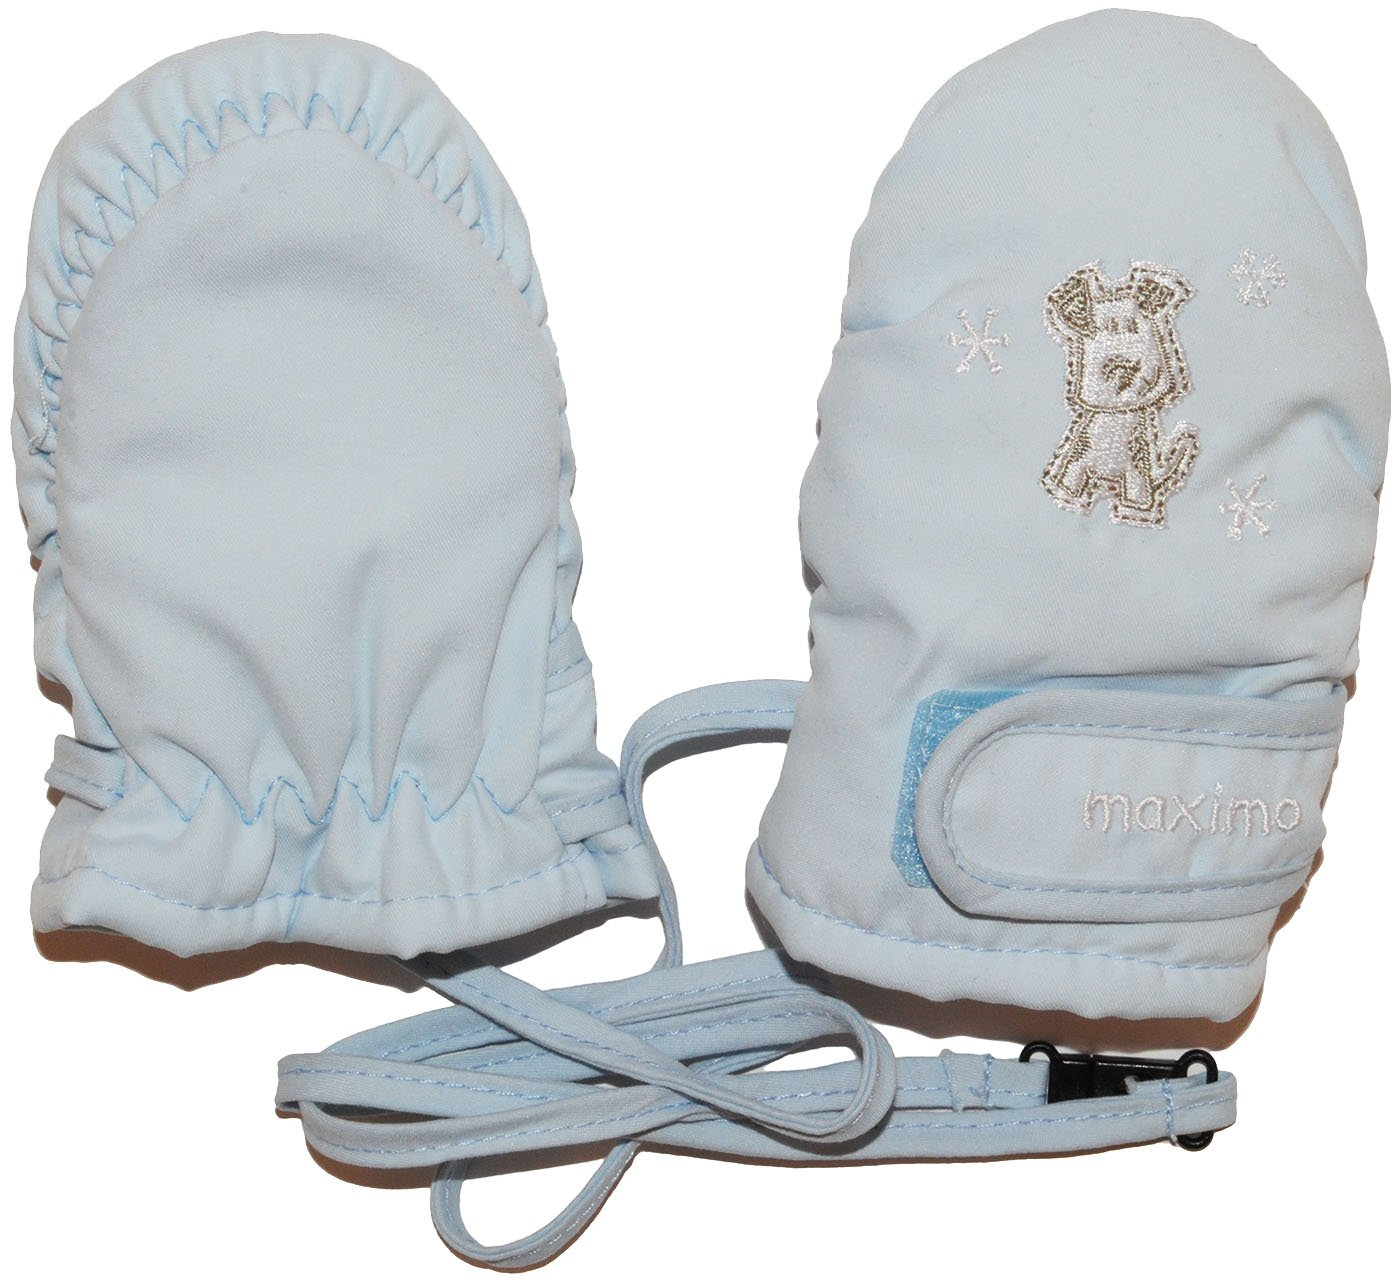 Unbekannt Handschuh Baby hell blau - Thermo Babyhandschuhe gefüttert Thermohandschuh - Gr. 0 bis 3 Monate - Fausthandschuh Handschuhe Kinder-Land